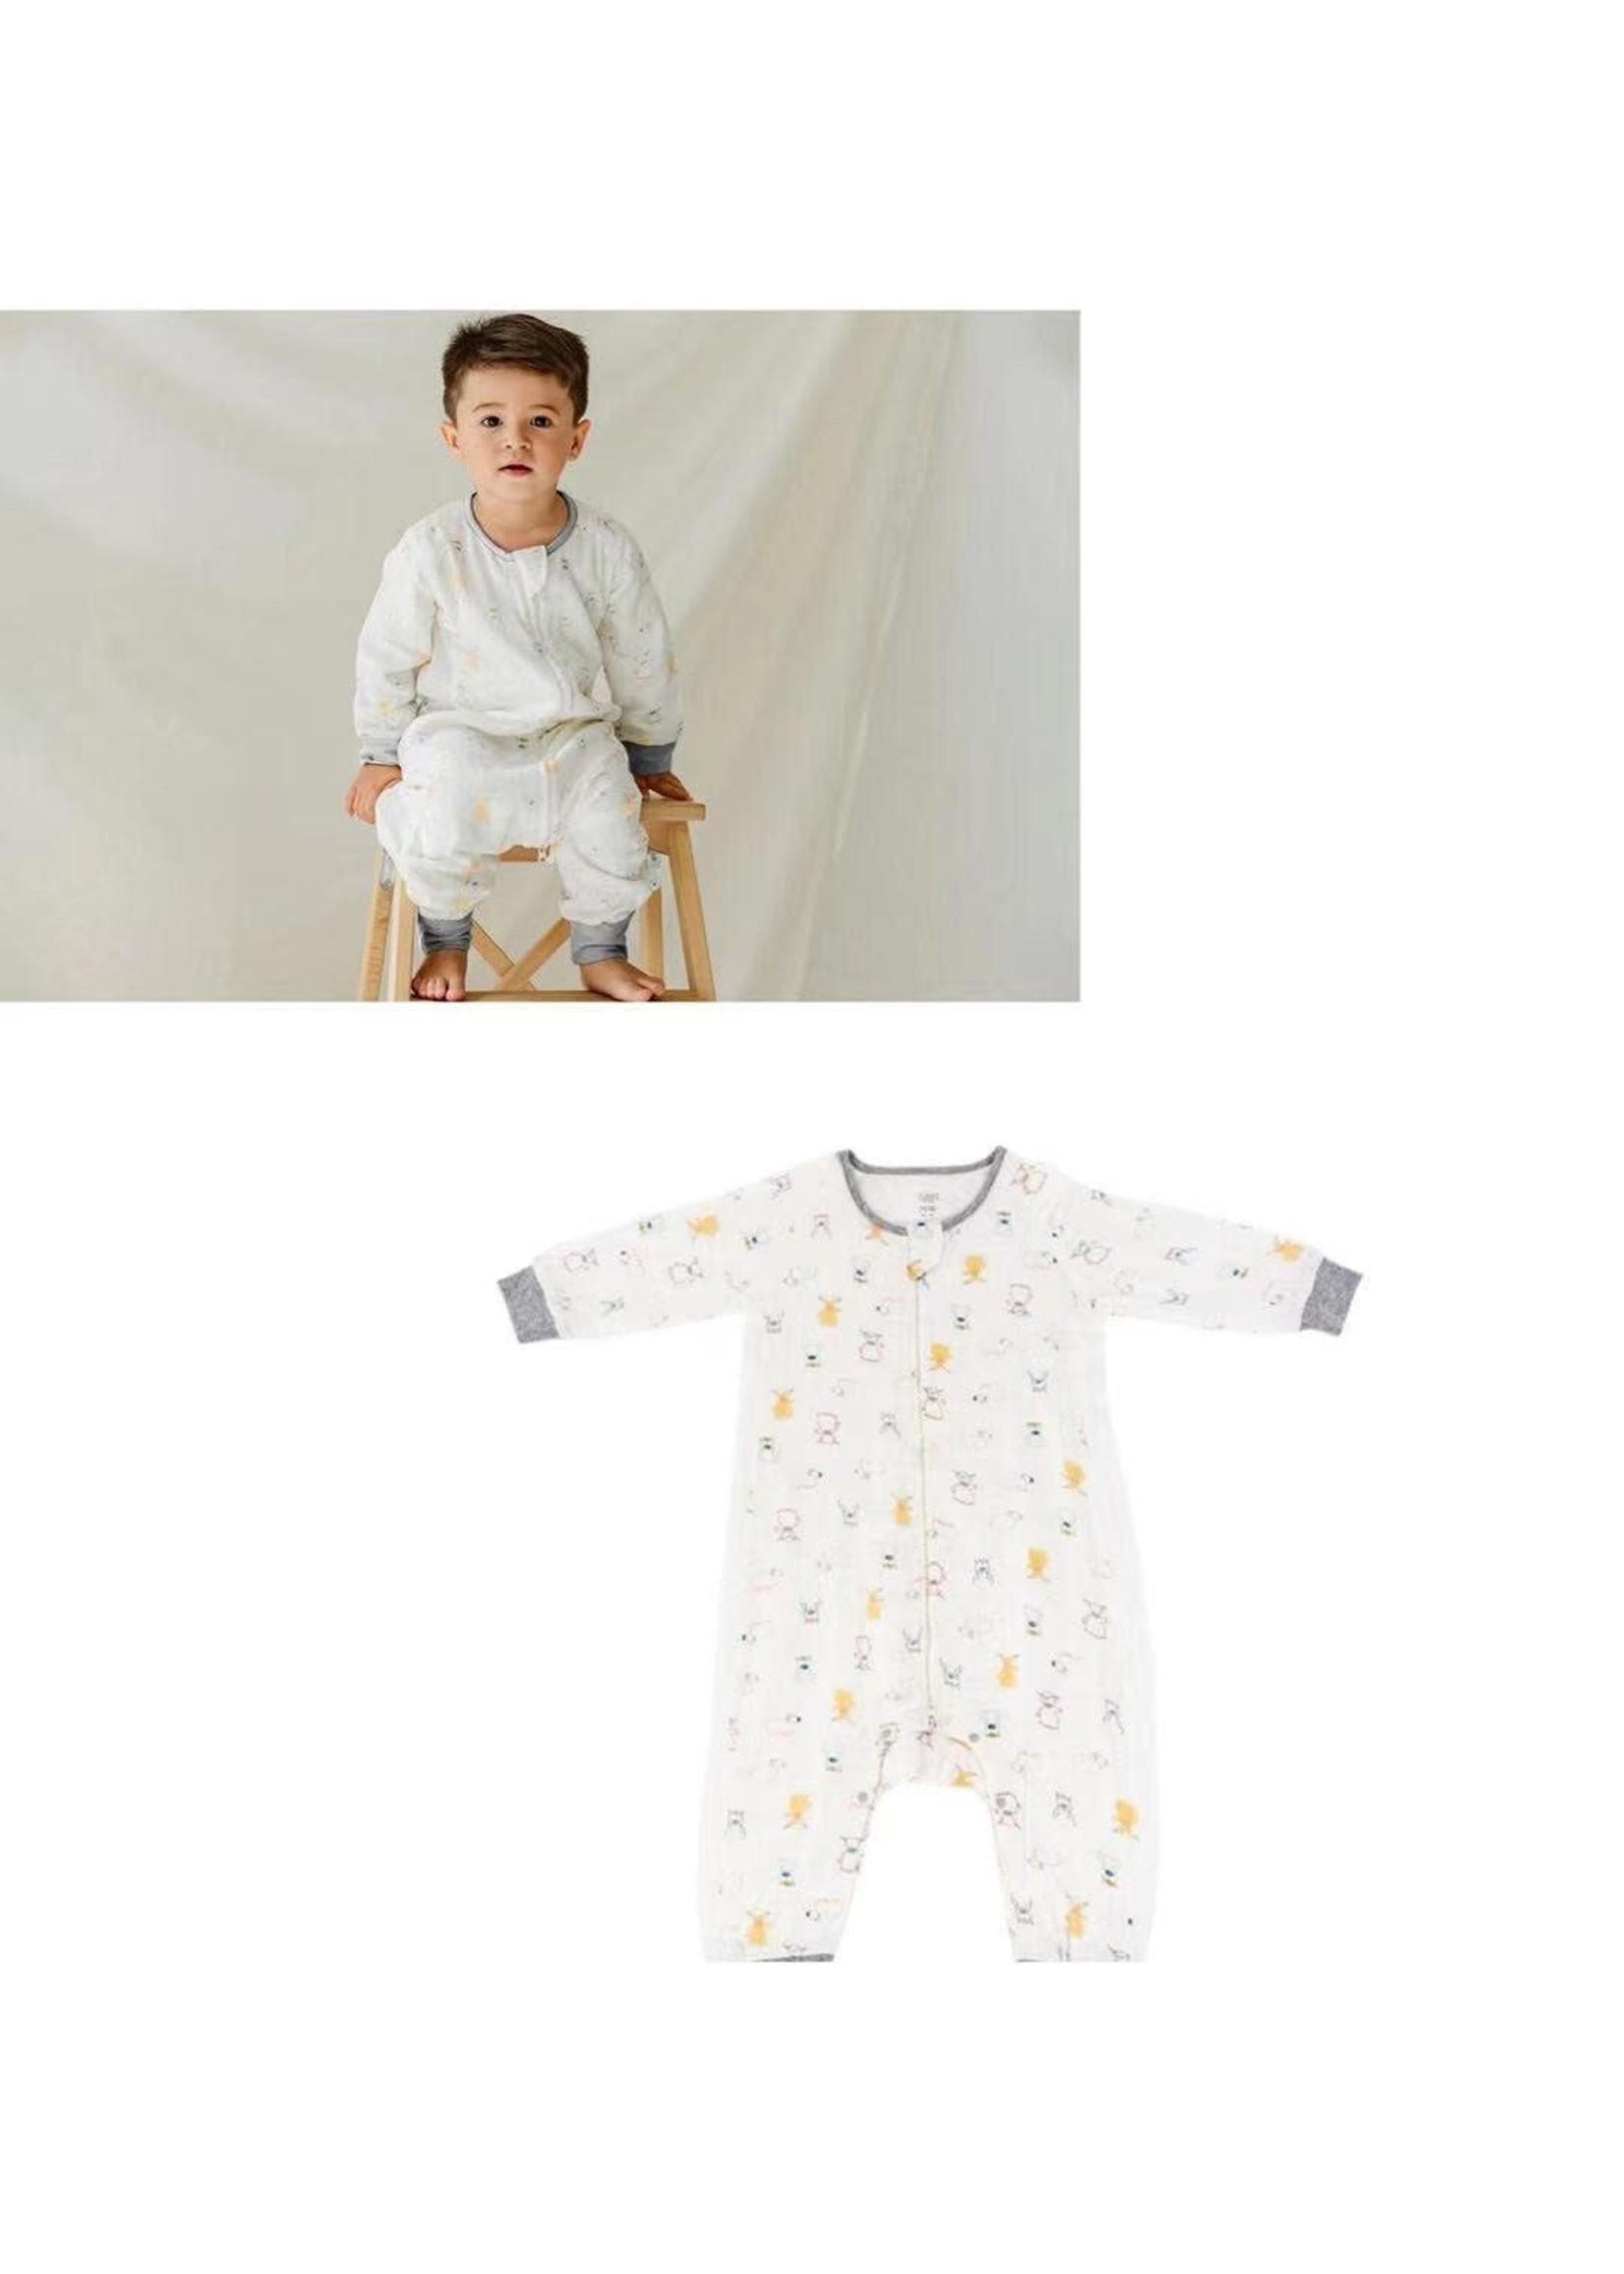 Nest Designs ND 0.6 Longsleeve Sleepsuit (Ox-Standing)